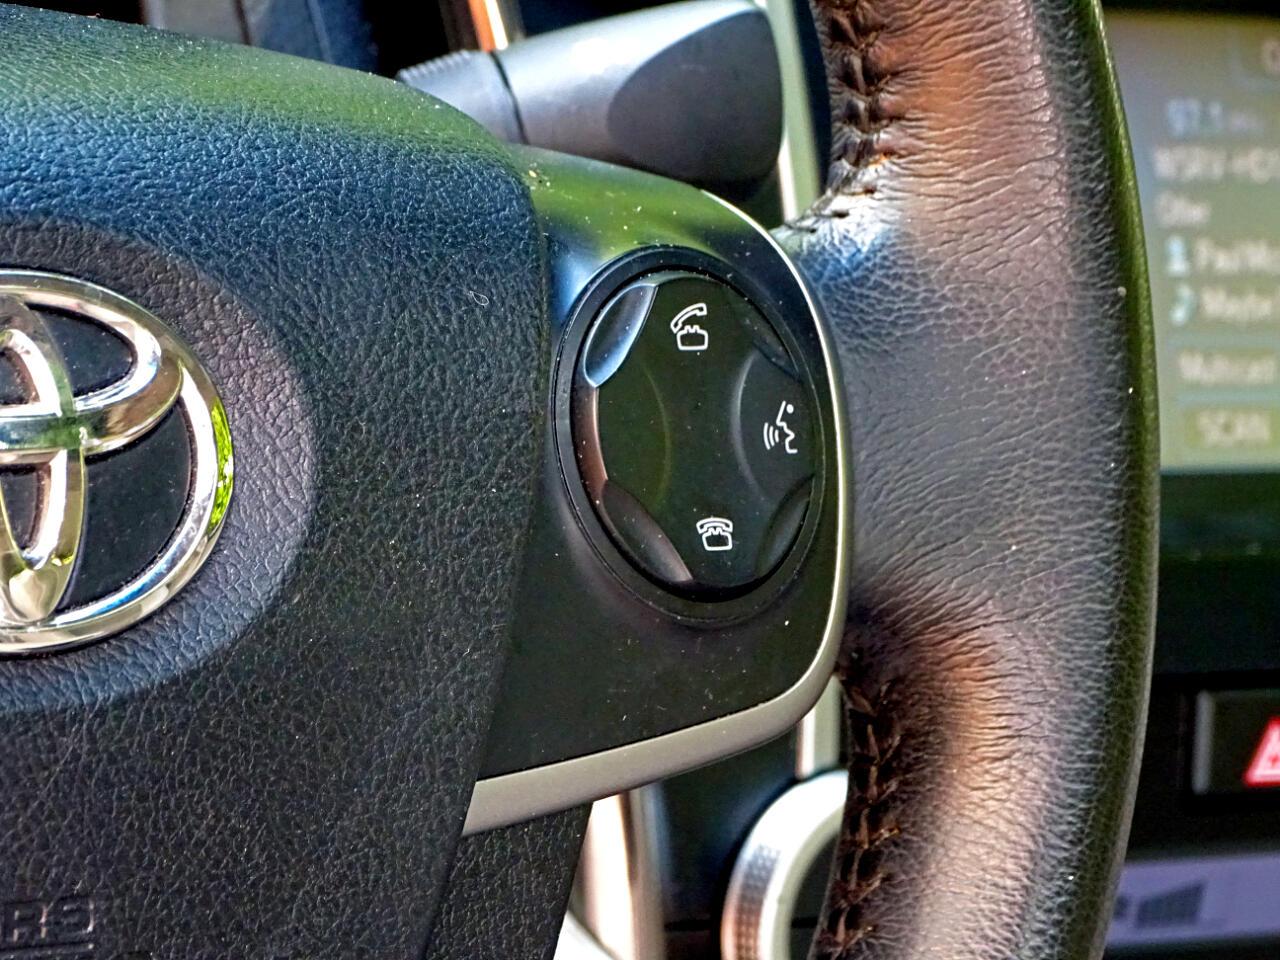 2012 Toyota Camry Hybrid 4dr Sdn XLE (Natl)